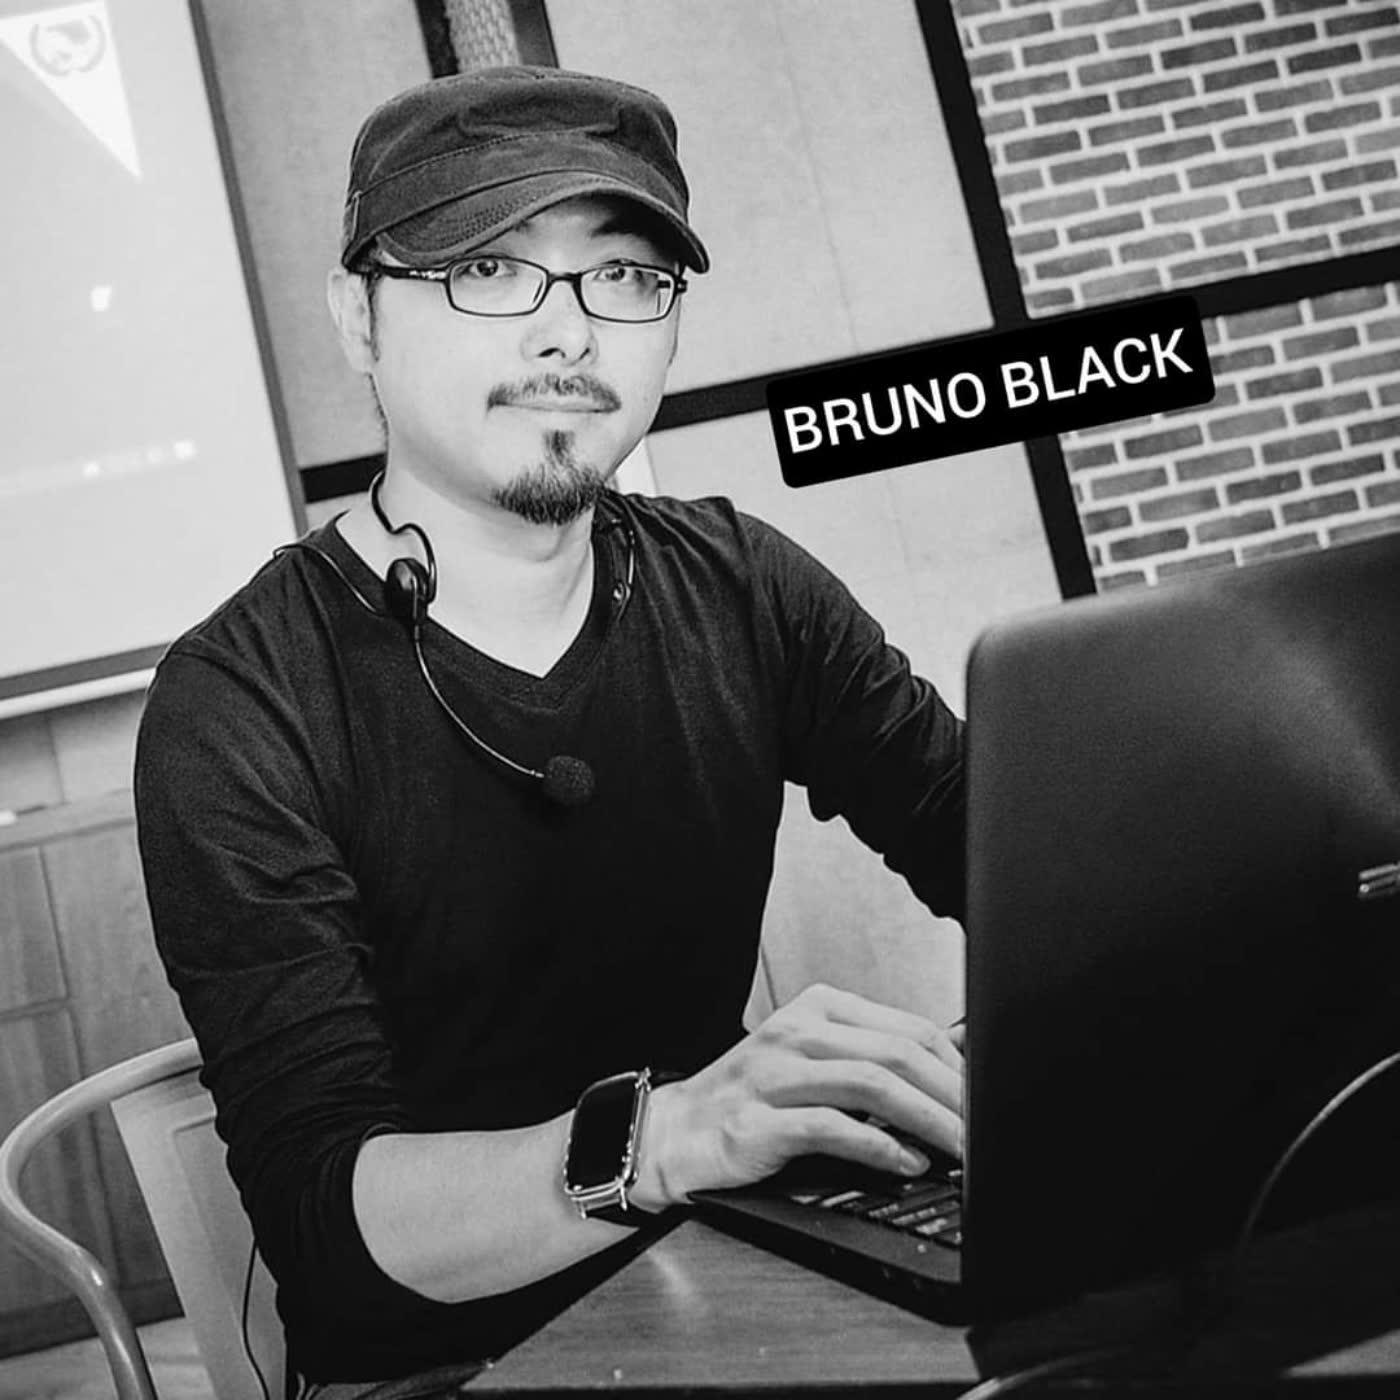 BRUNO BLACK / I am the Brand